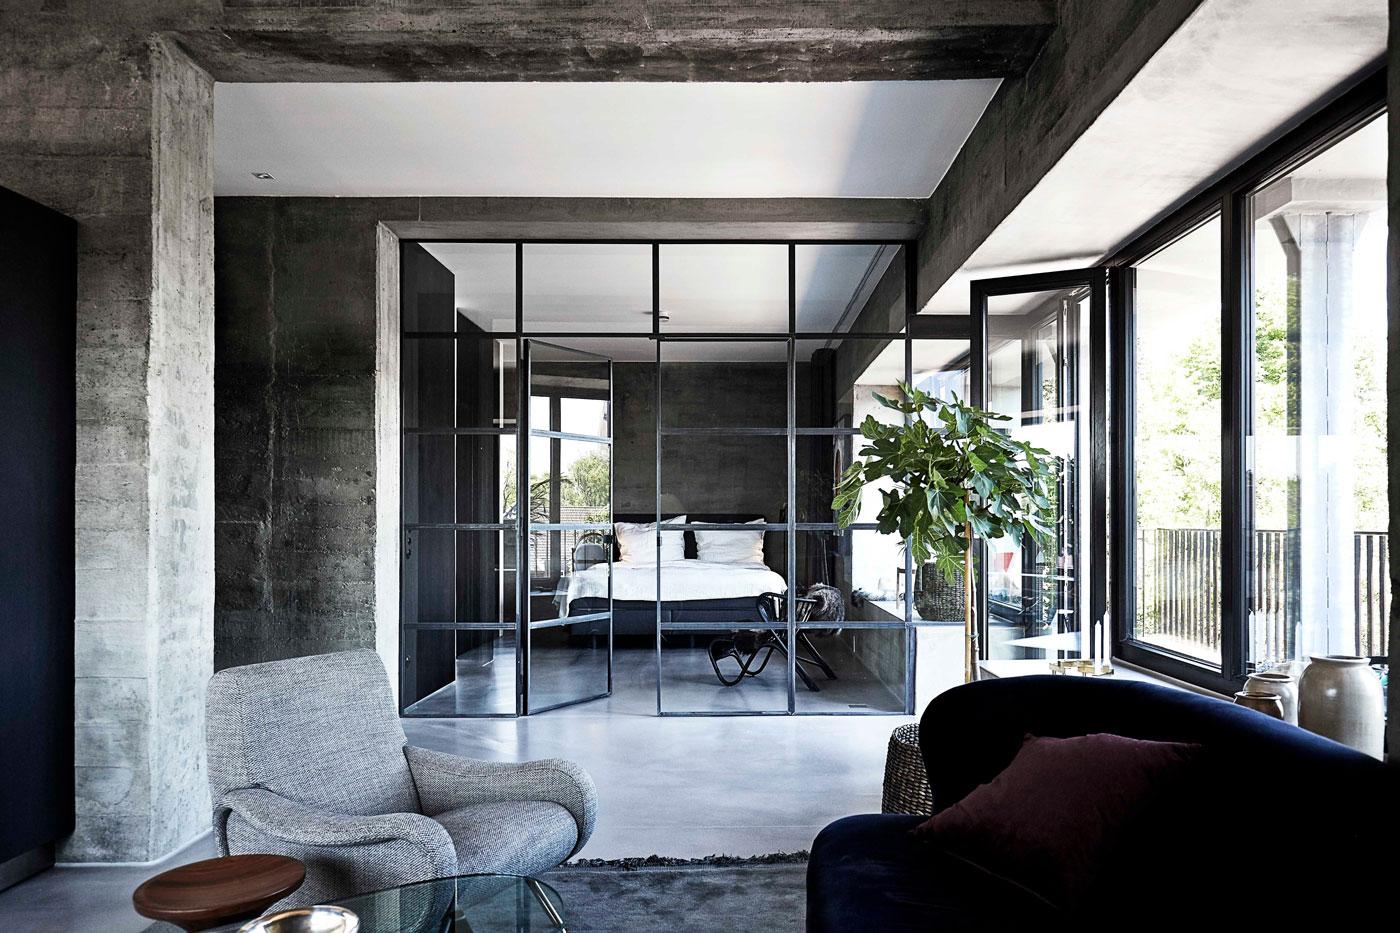 Thick concrete walls